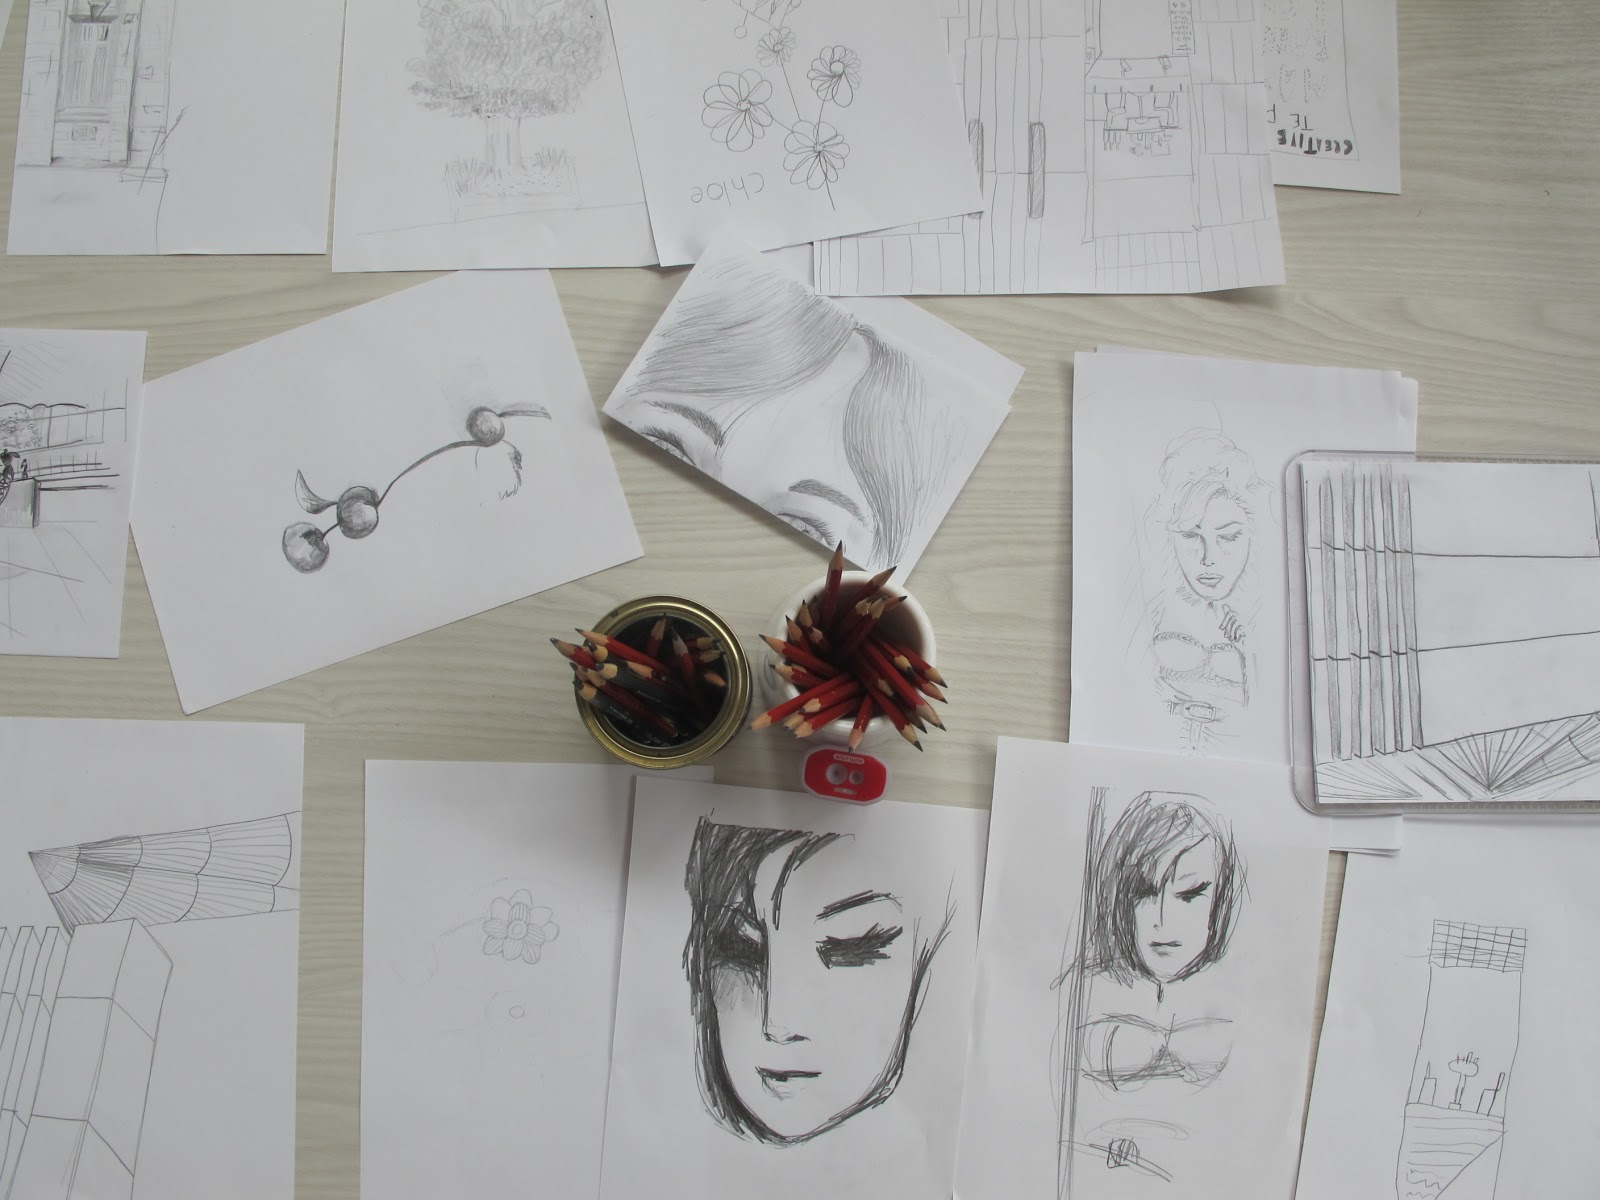 http://rfacdn.nz/artgallery/assets/media/blog-drop-in-drawing-stay-3.jpg